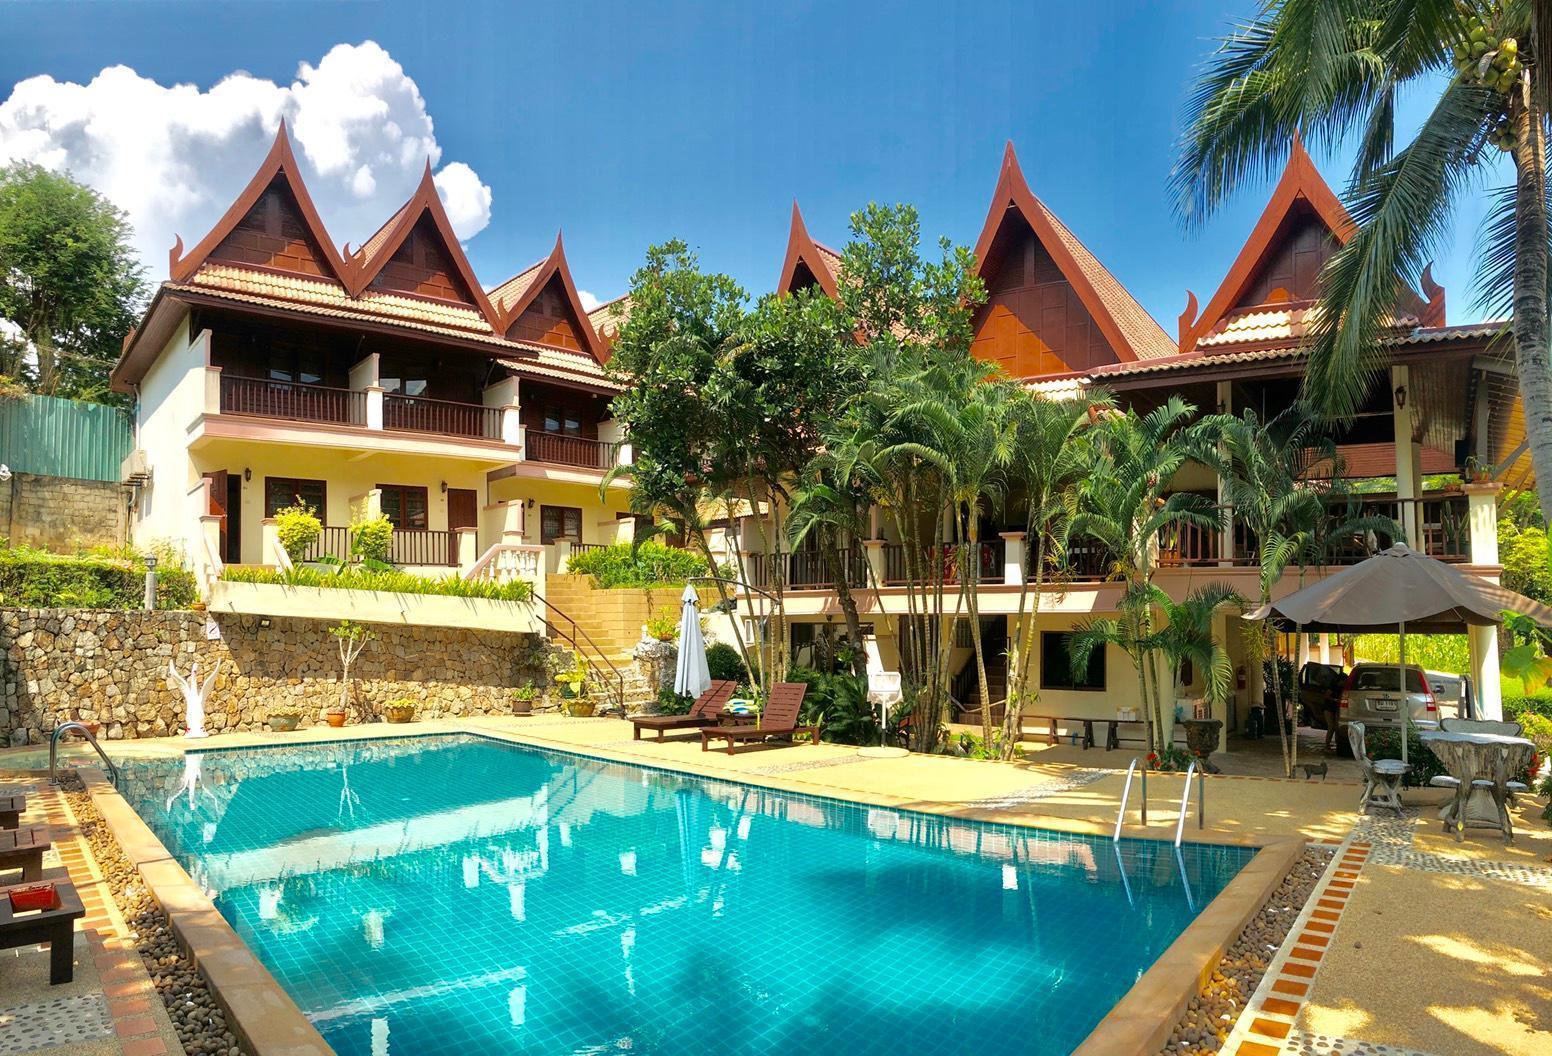 Kata Interhouse Resort อินเตอร์เฮาส์